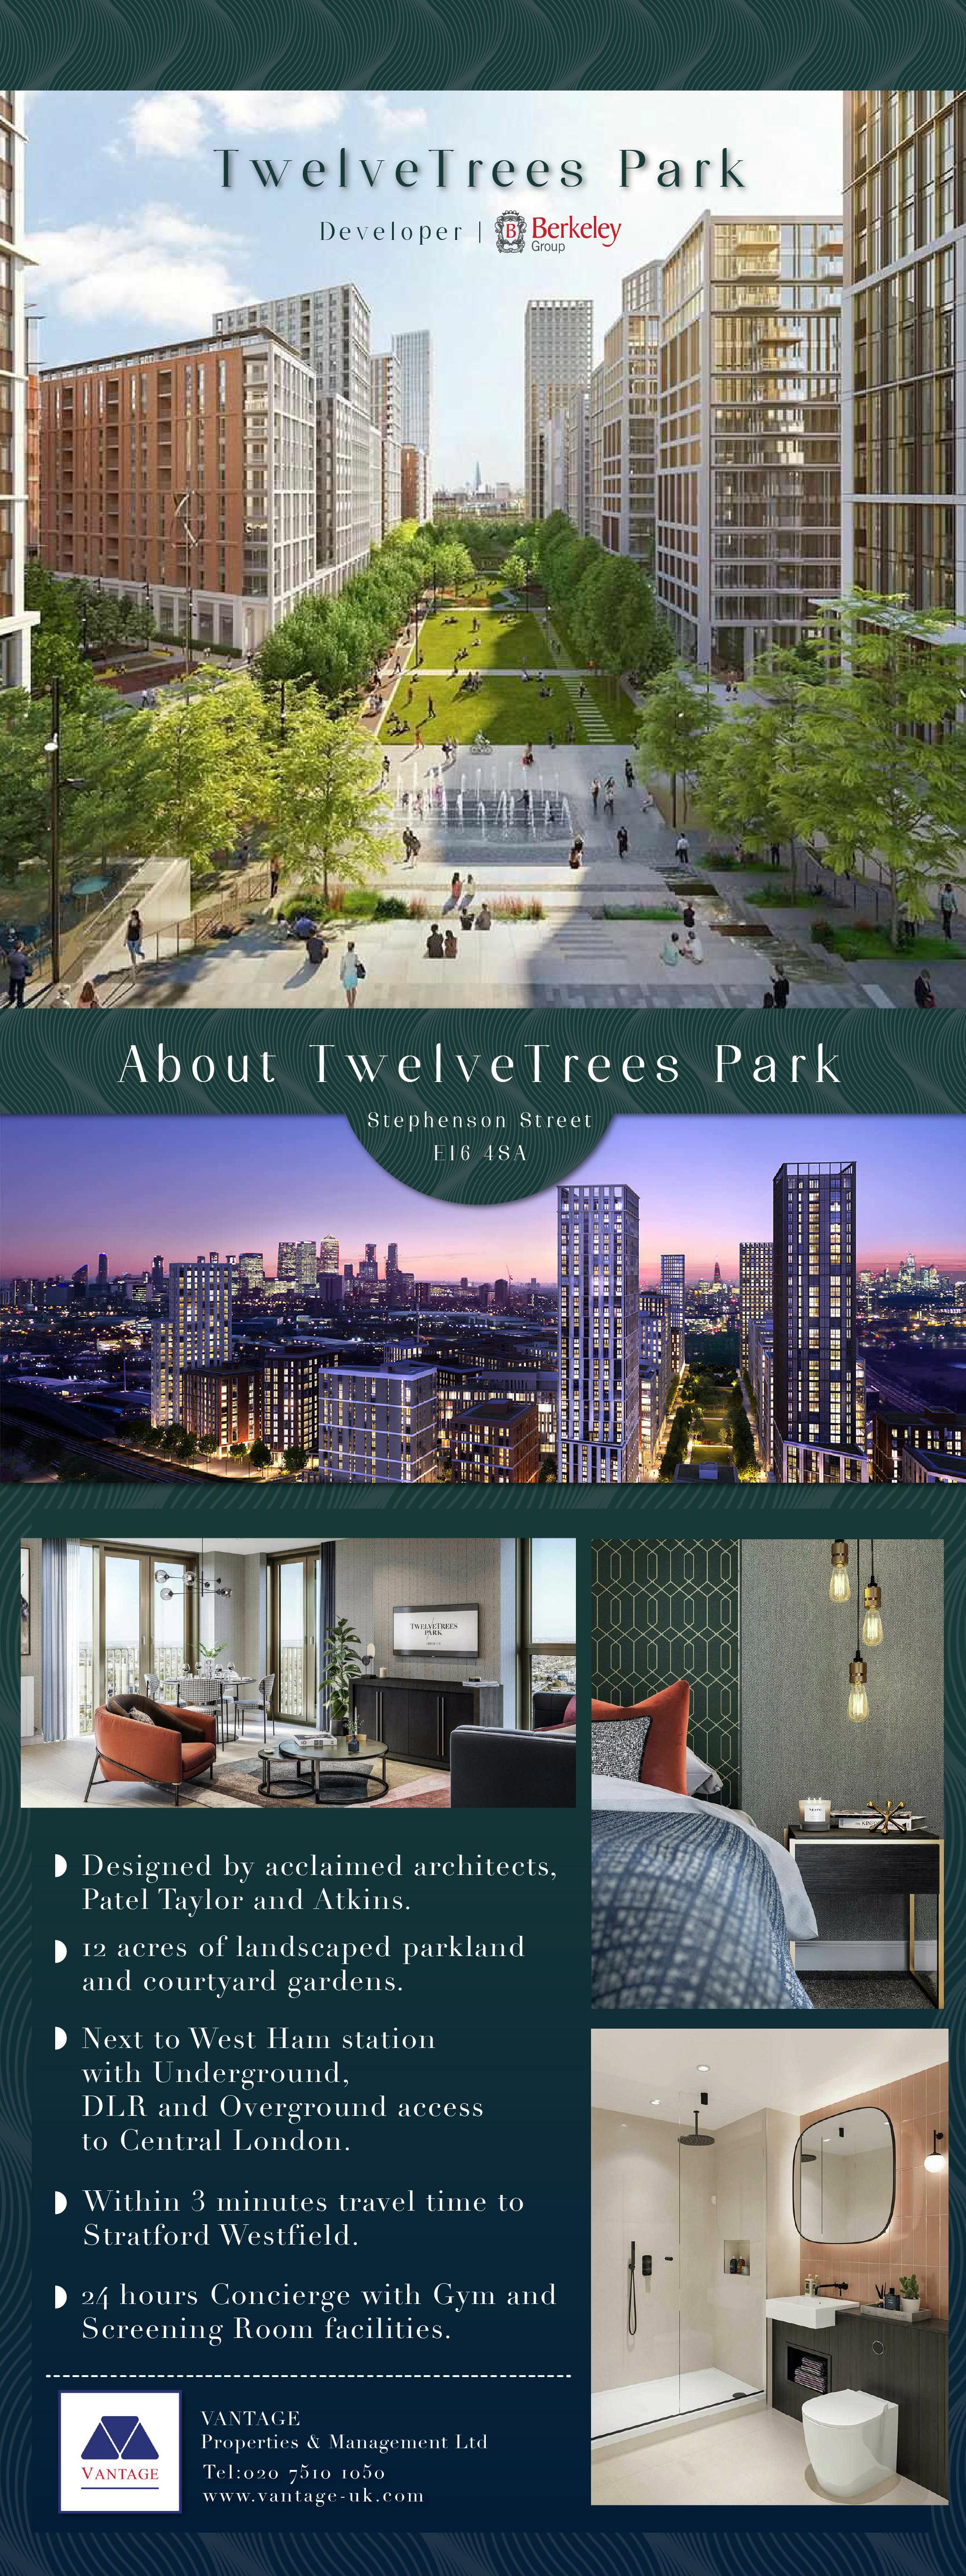 Monthly Marketing Activity - TwelveTrees Park E15